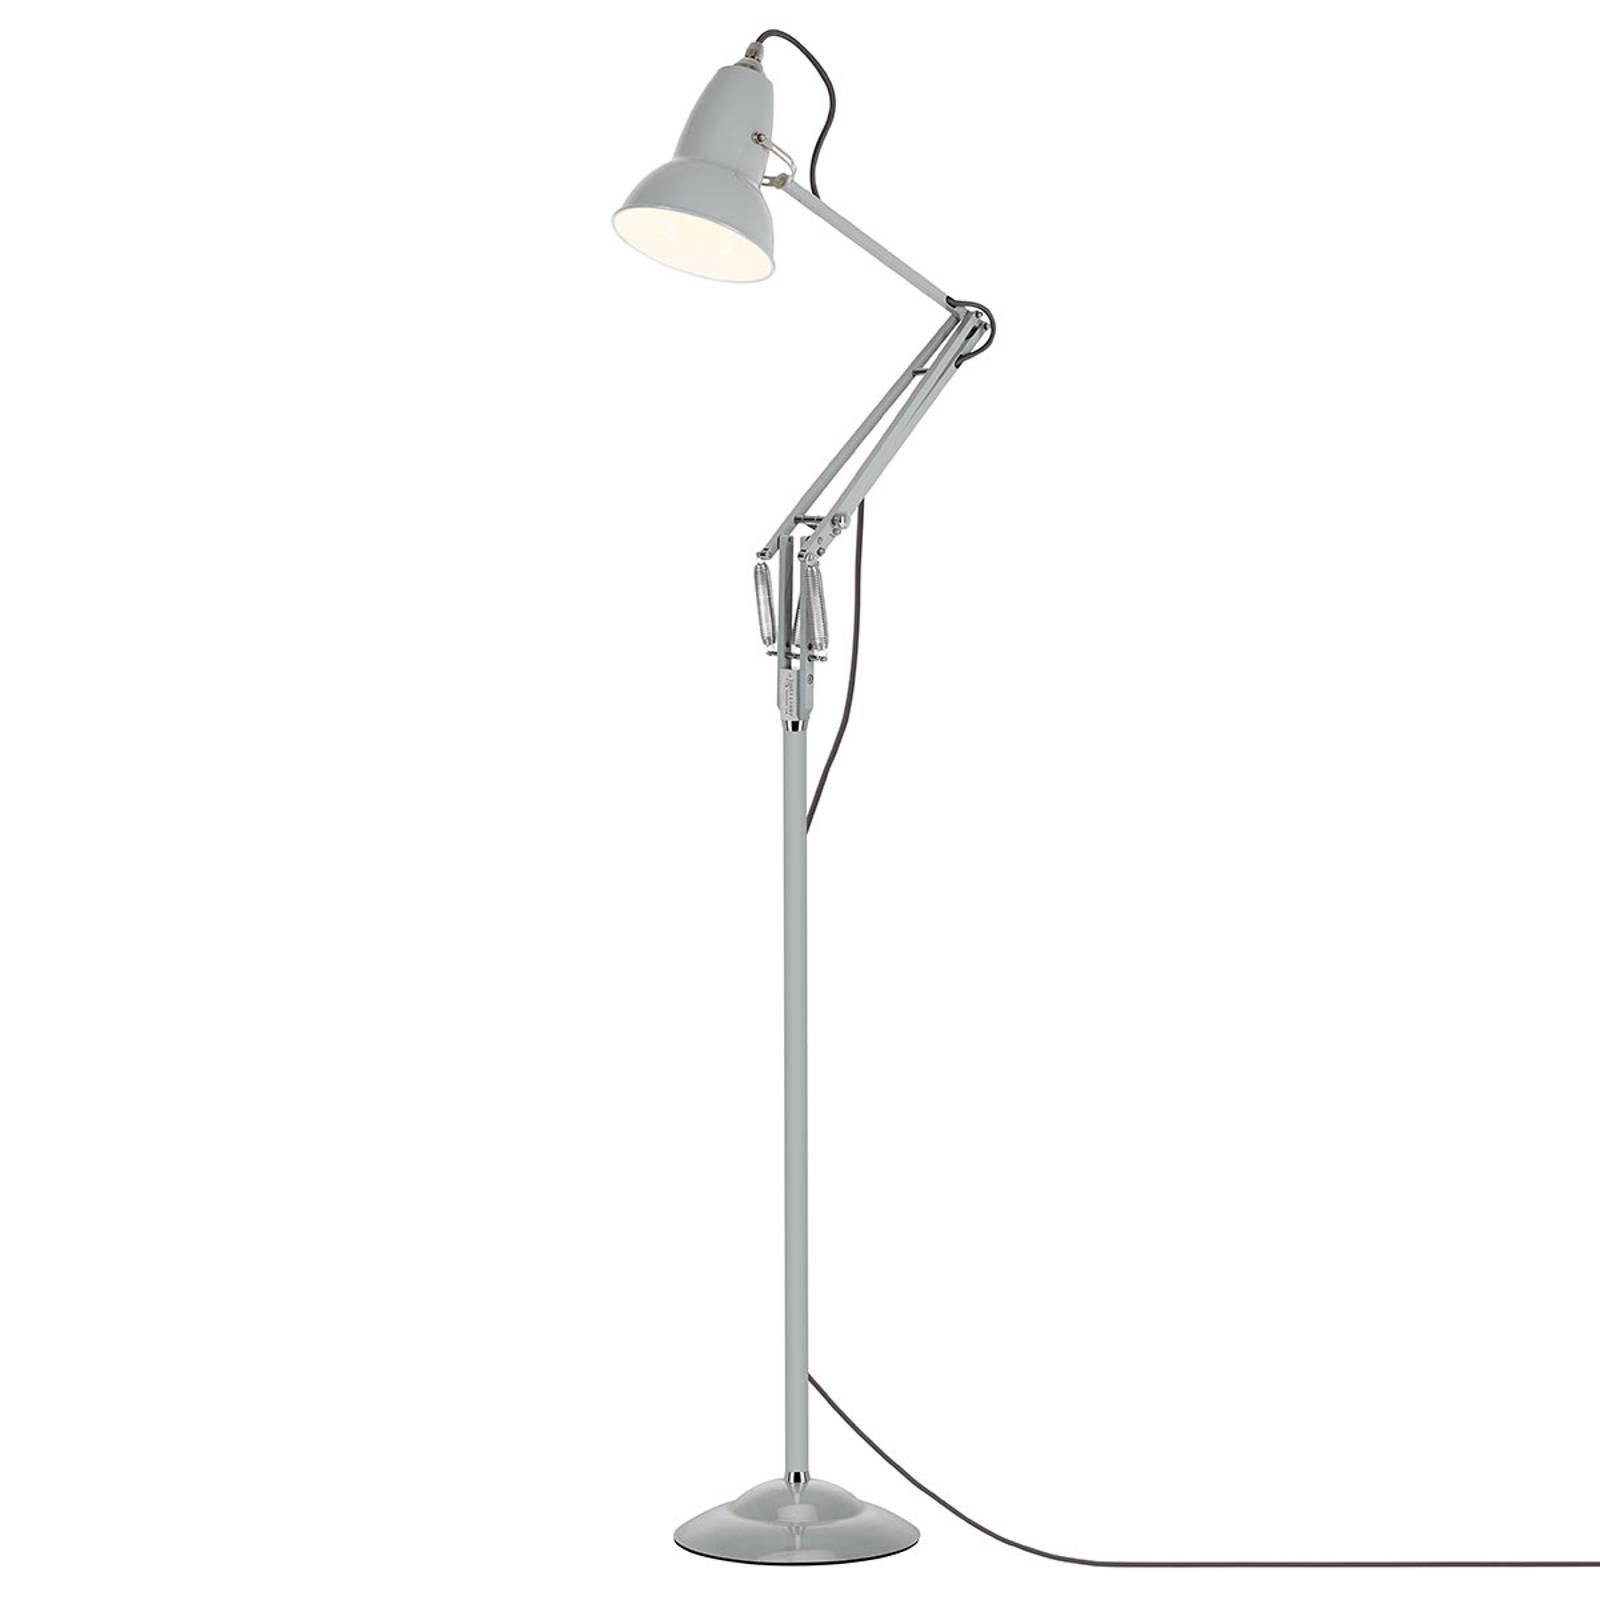 Anglepoise Original 1227 gulvlampe duegrå